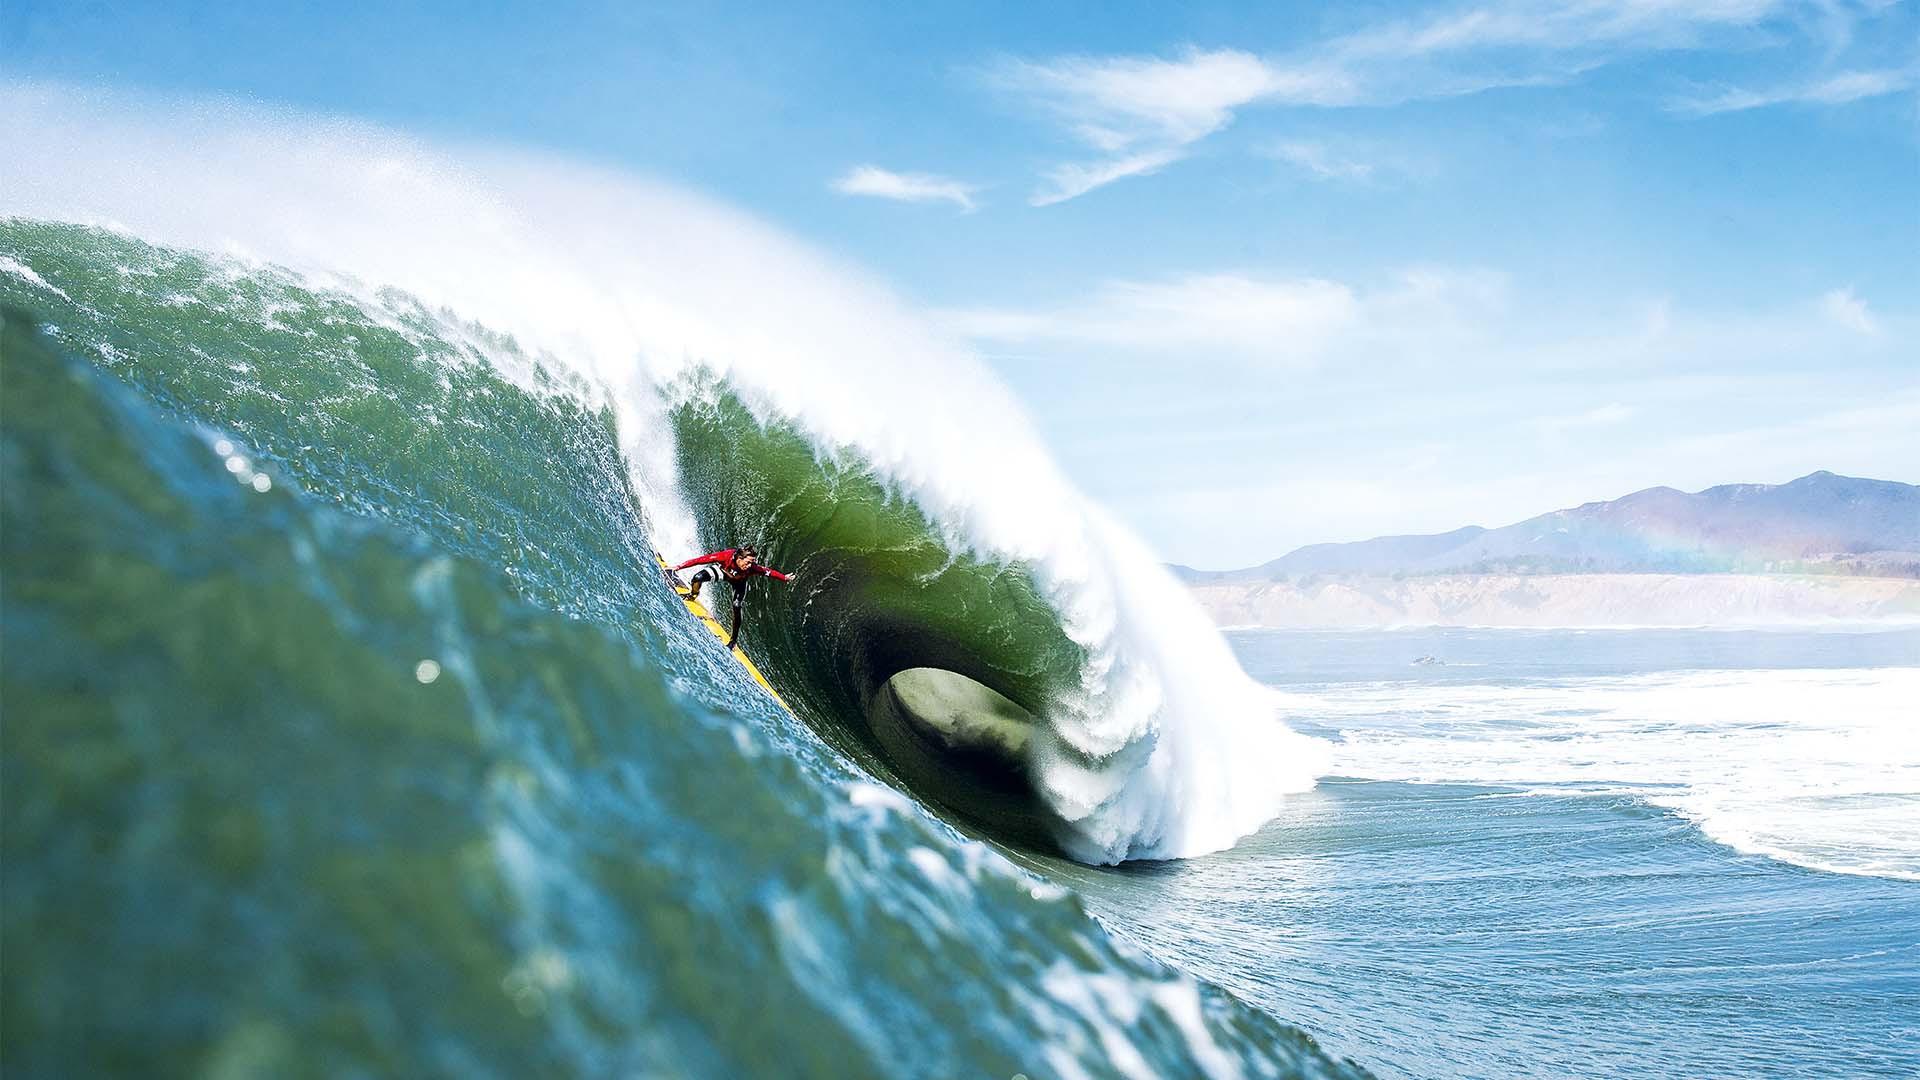 Kai Lenny surfing Mavericks in California, USA